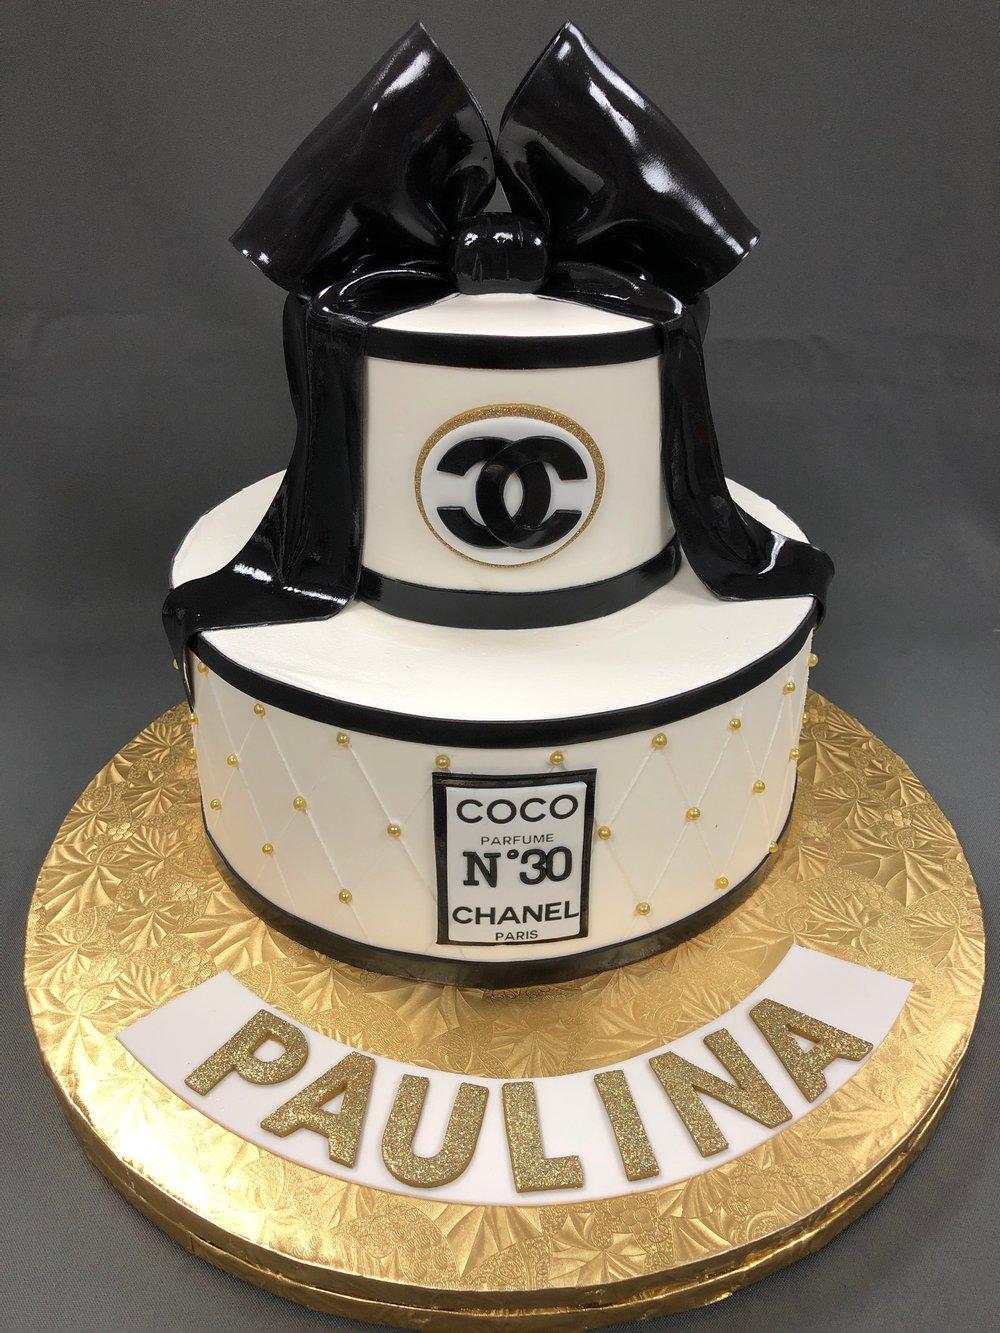 Coco Chanel Birthday Cake New Jersey